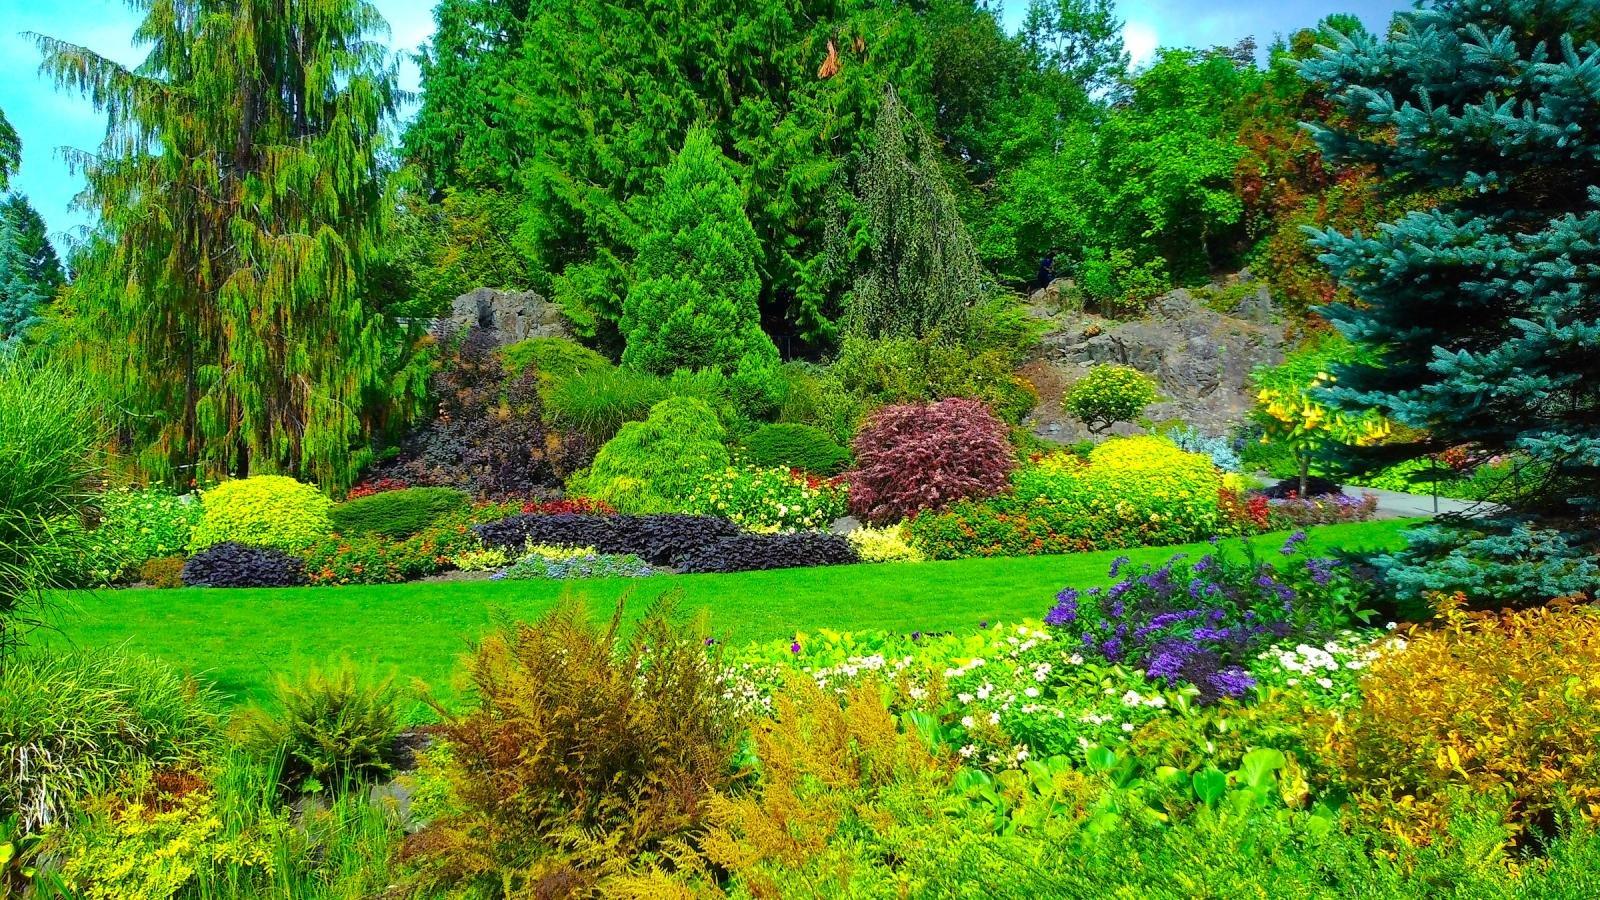 High Resolution Garden Hd 1600x900 Background Id 397033 For Desktop